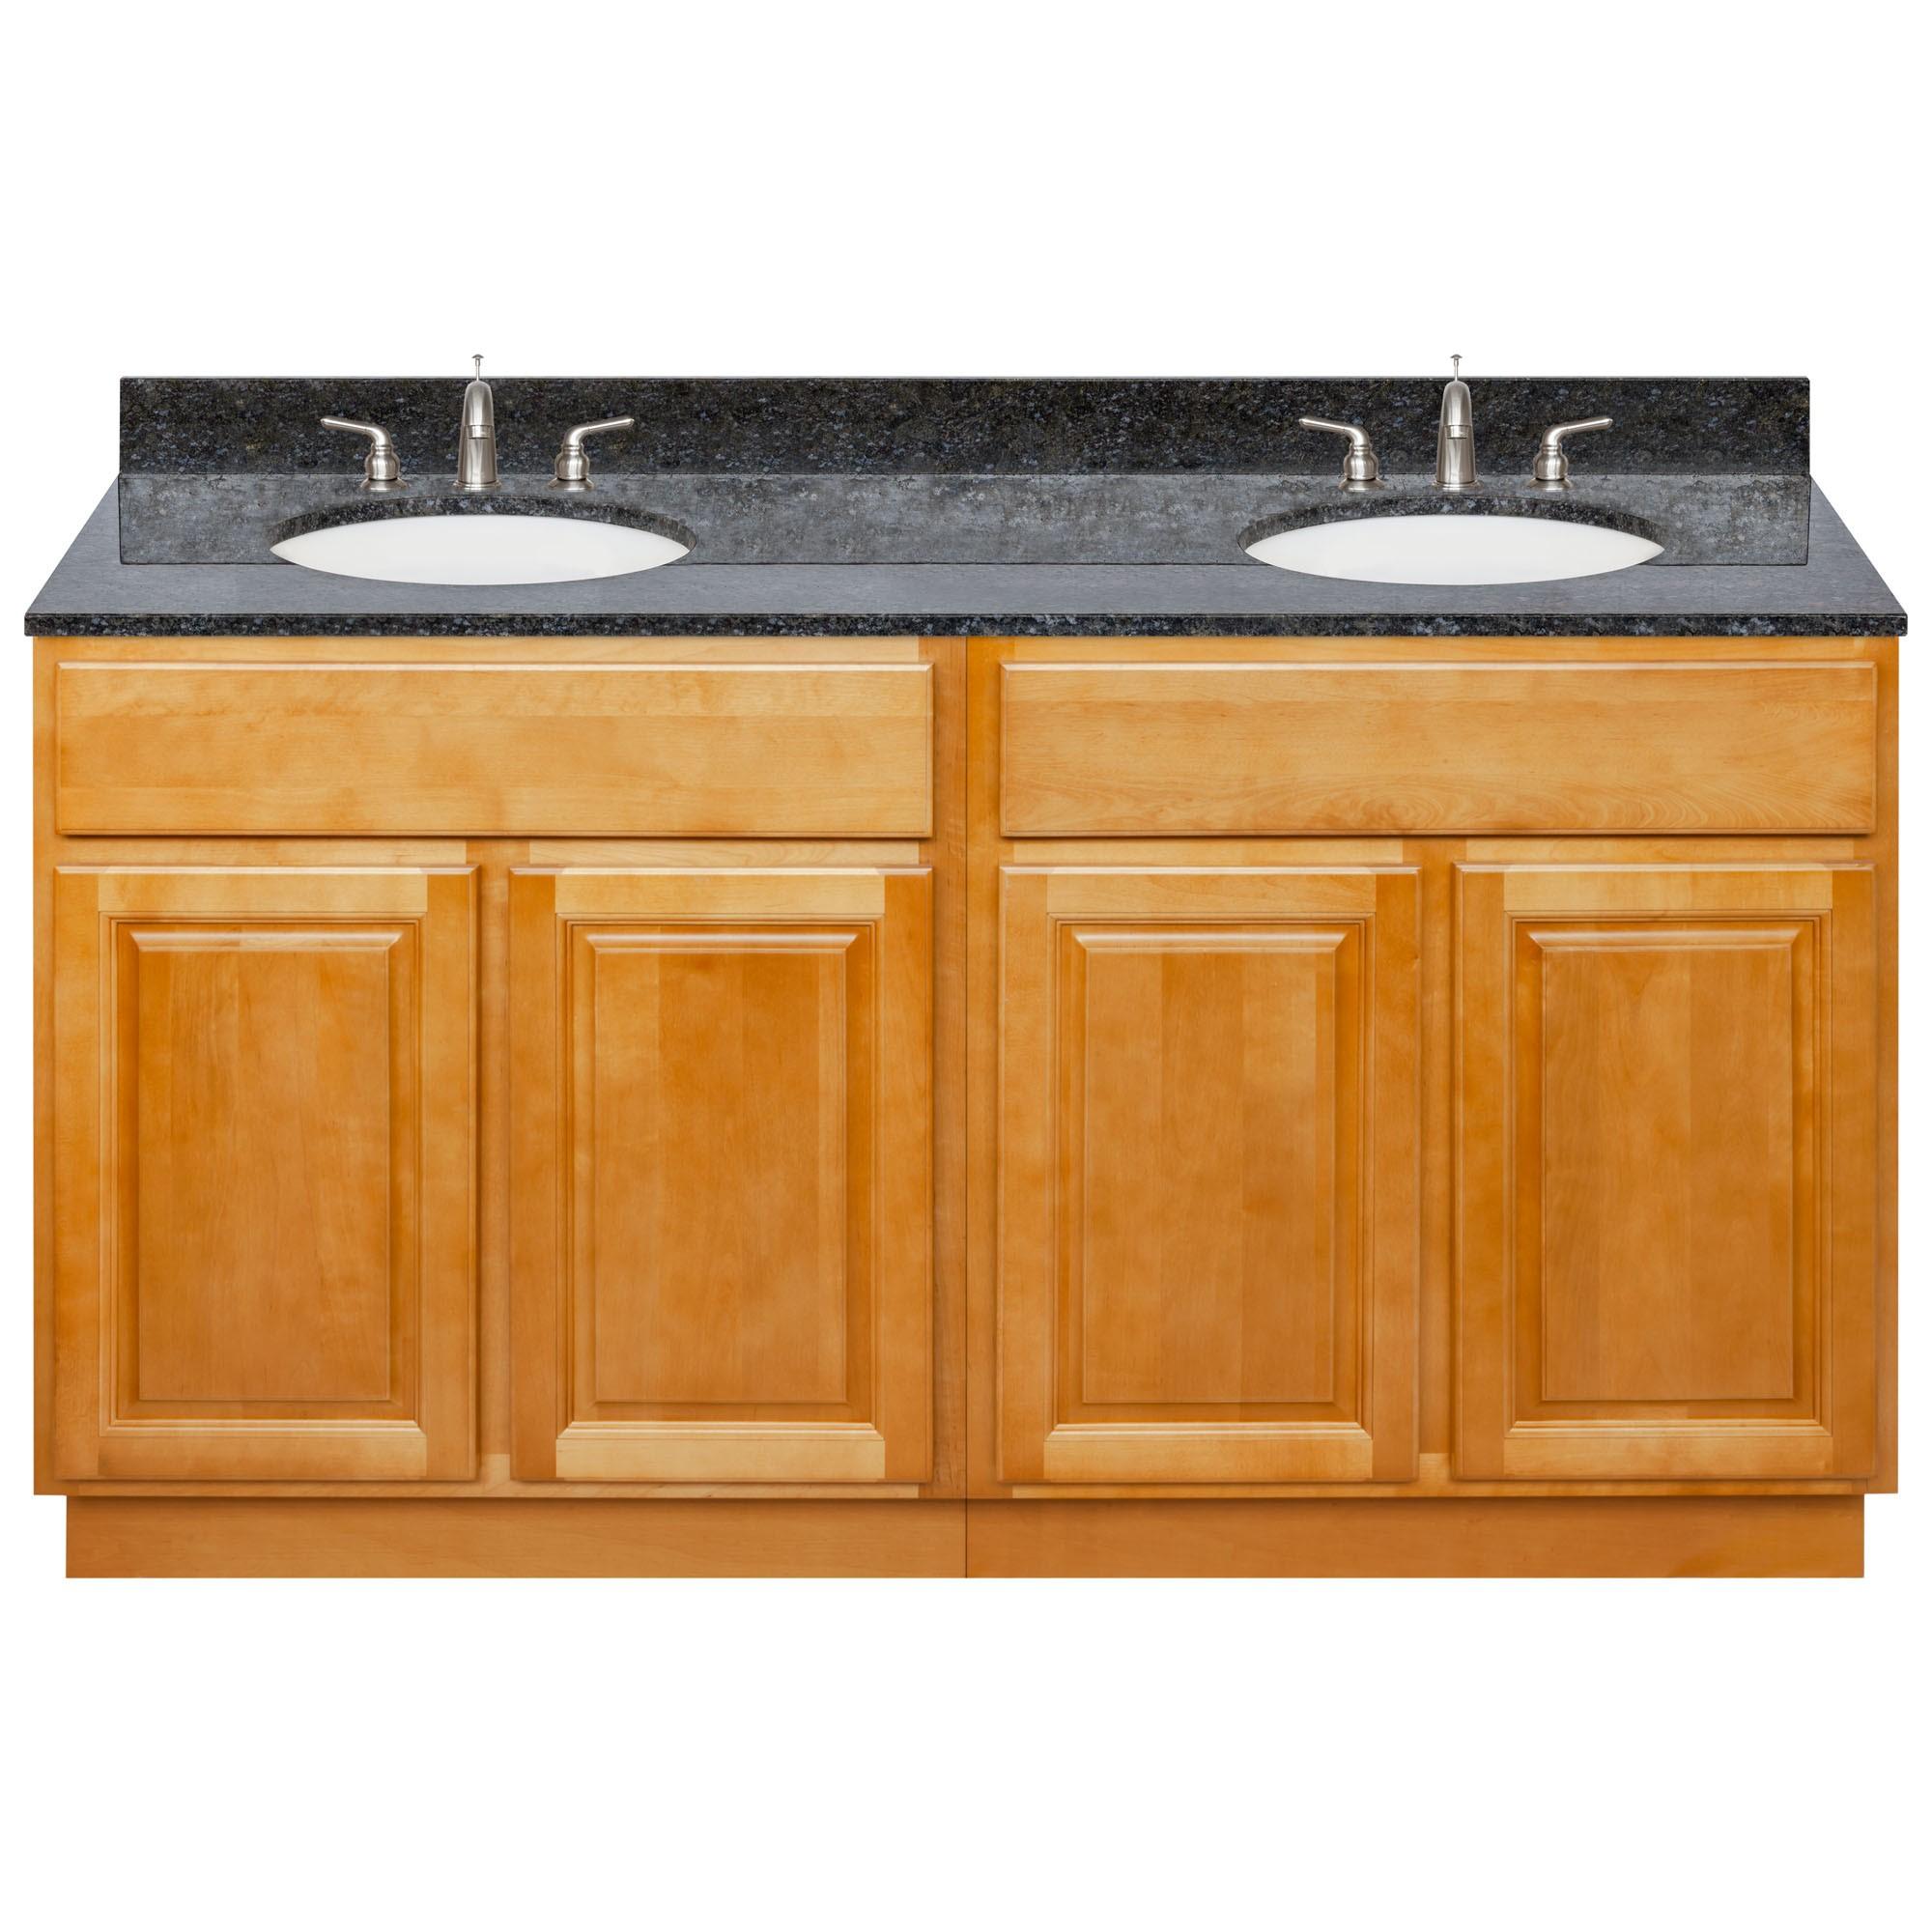 Brown Double Bathroom Vanity 60 Blue Butterfly Granite Top Faucet Lb4b Walmart Com Walmart Com